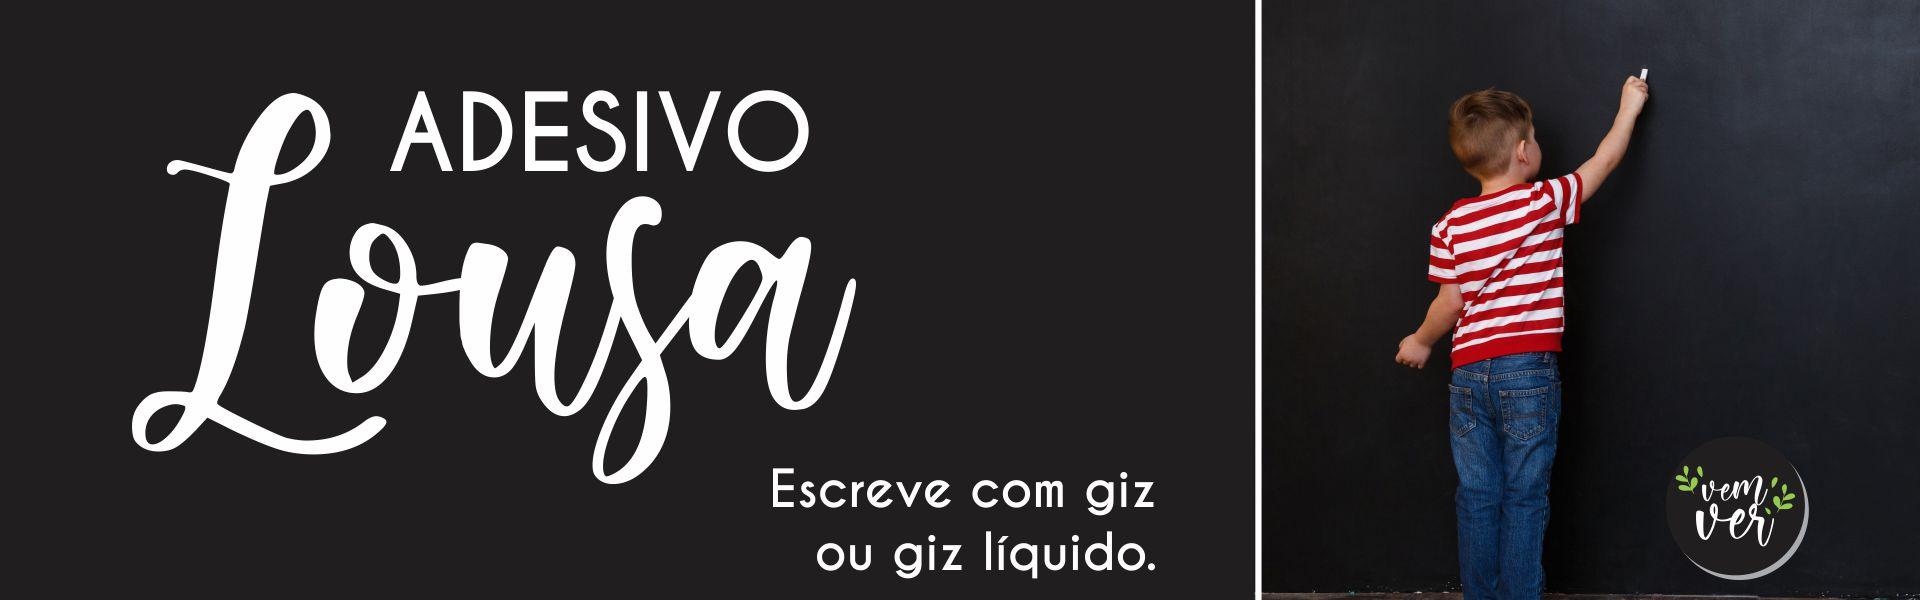 Banner Lousa